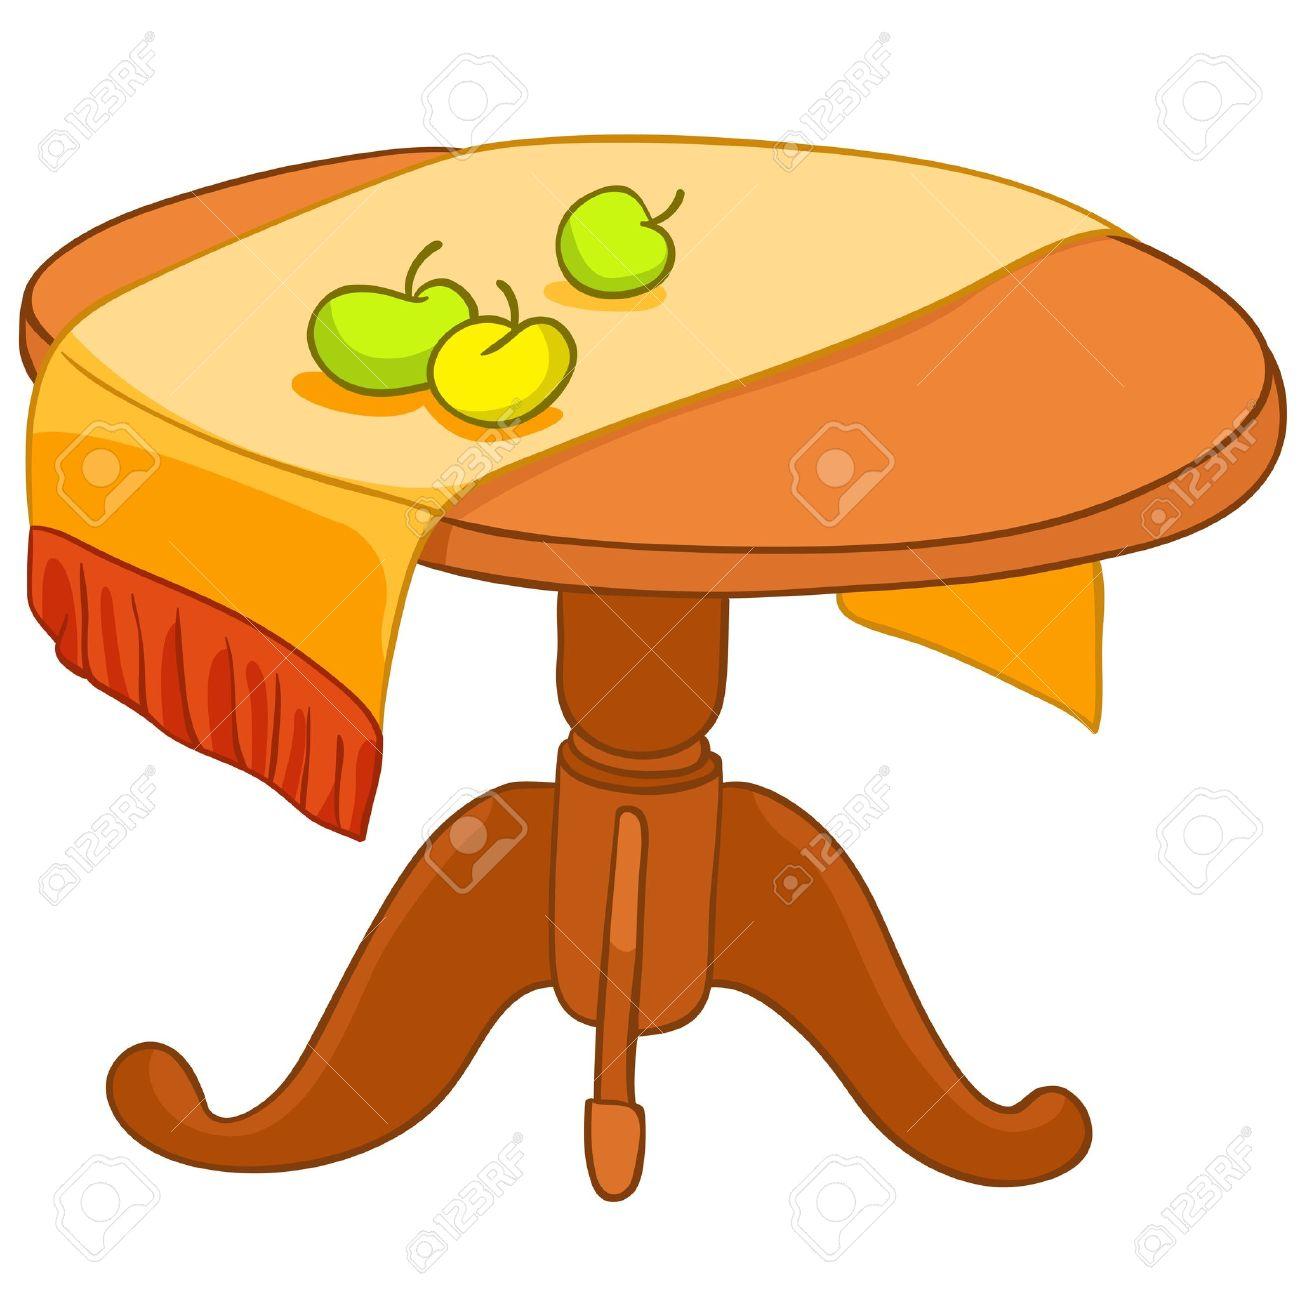 Cartoon Home Furniture Table Stock Vector - 12681000